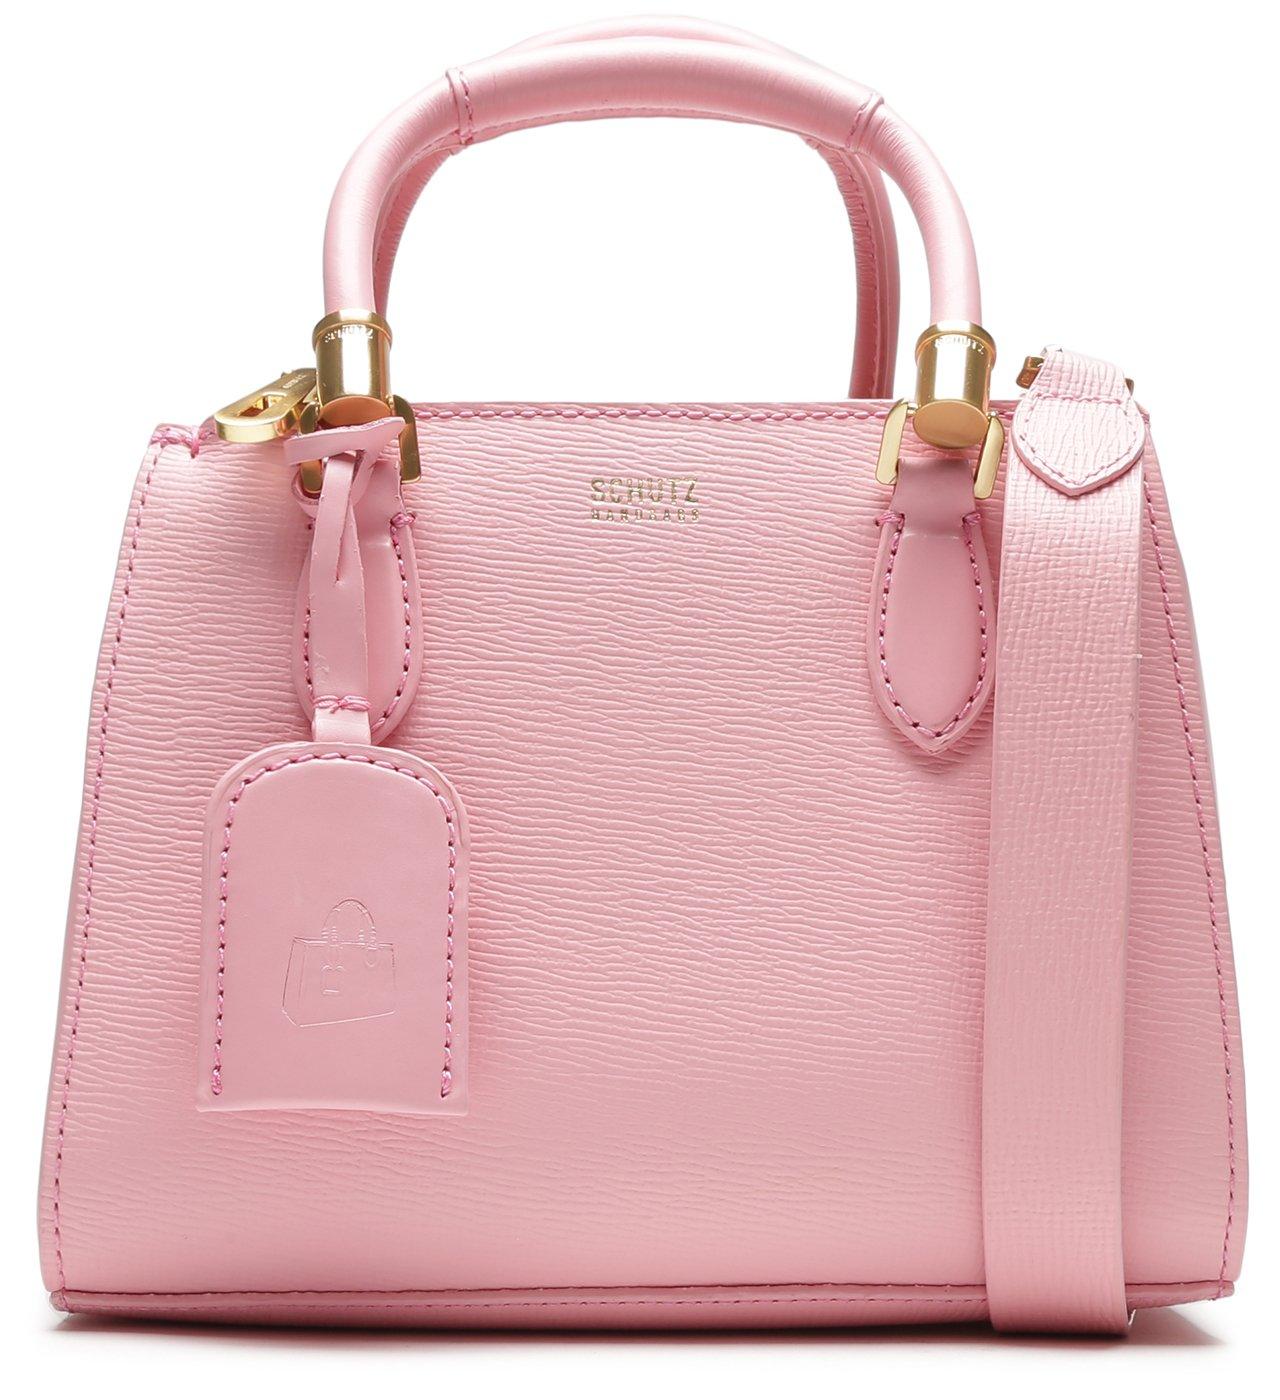 Mini Tote Lorena Pink | Schutz